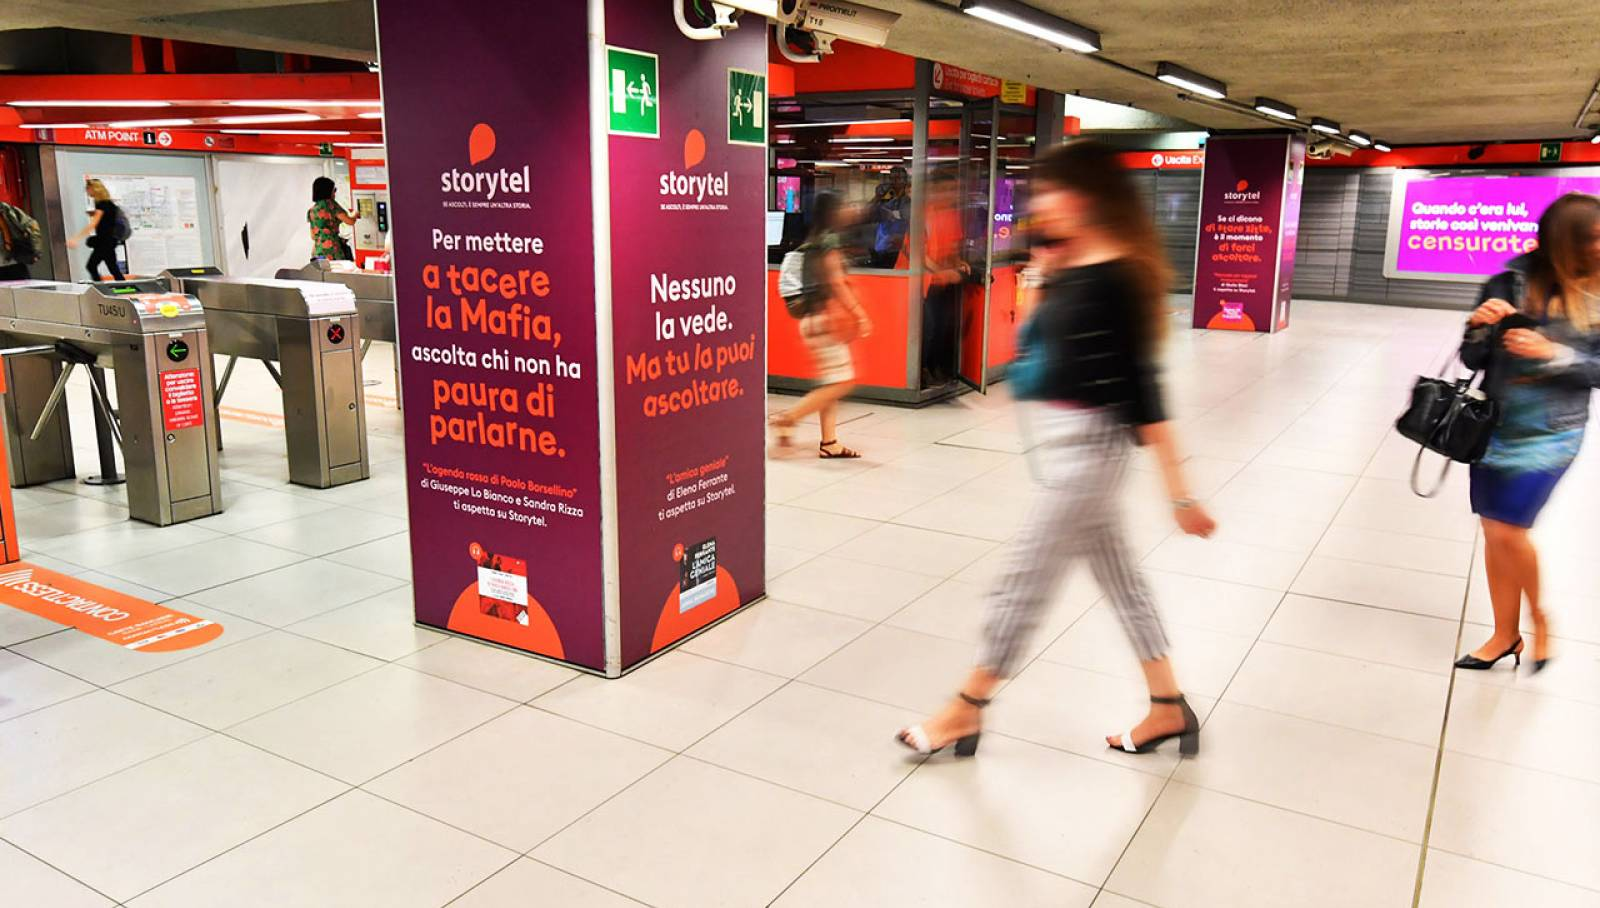 IGPDecaux Milano Station Domination per Storytel